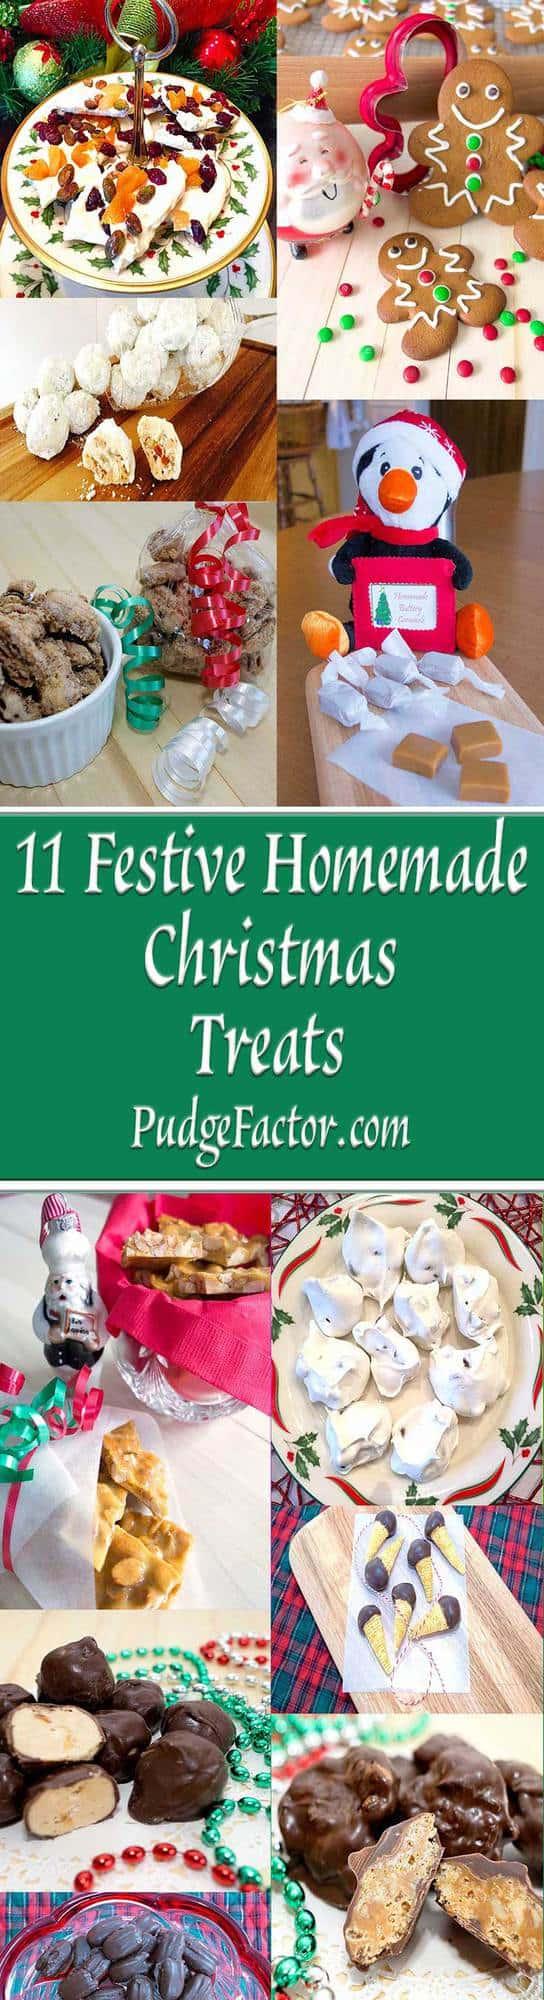 11 Festive Homemade Christmas Treats